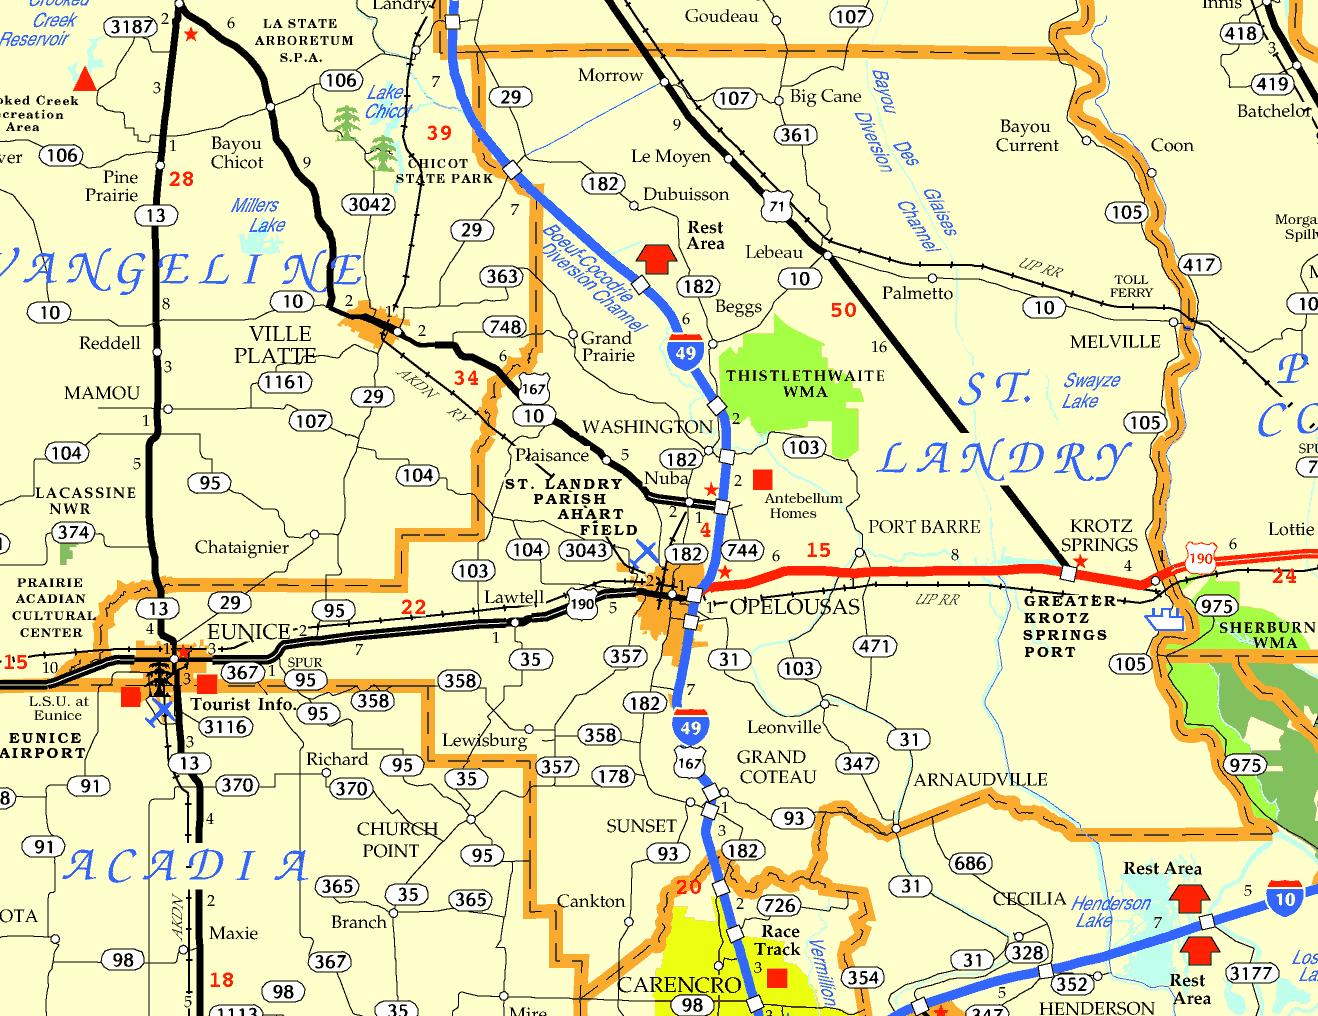 DOTD Tourism Map of St. Landry Parish